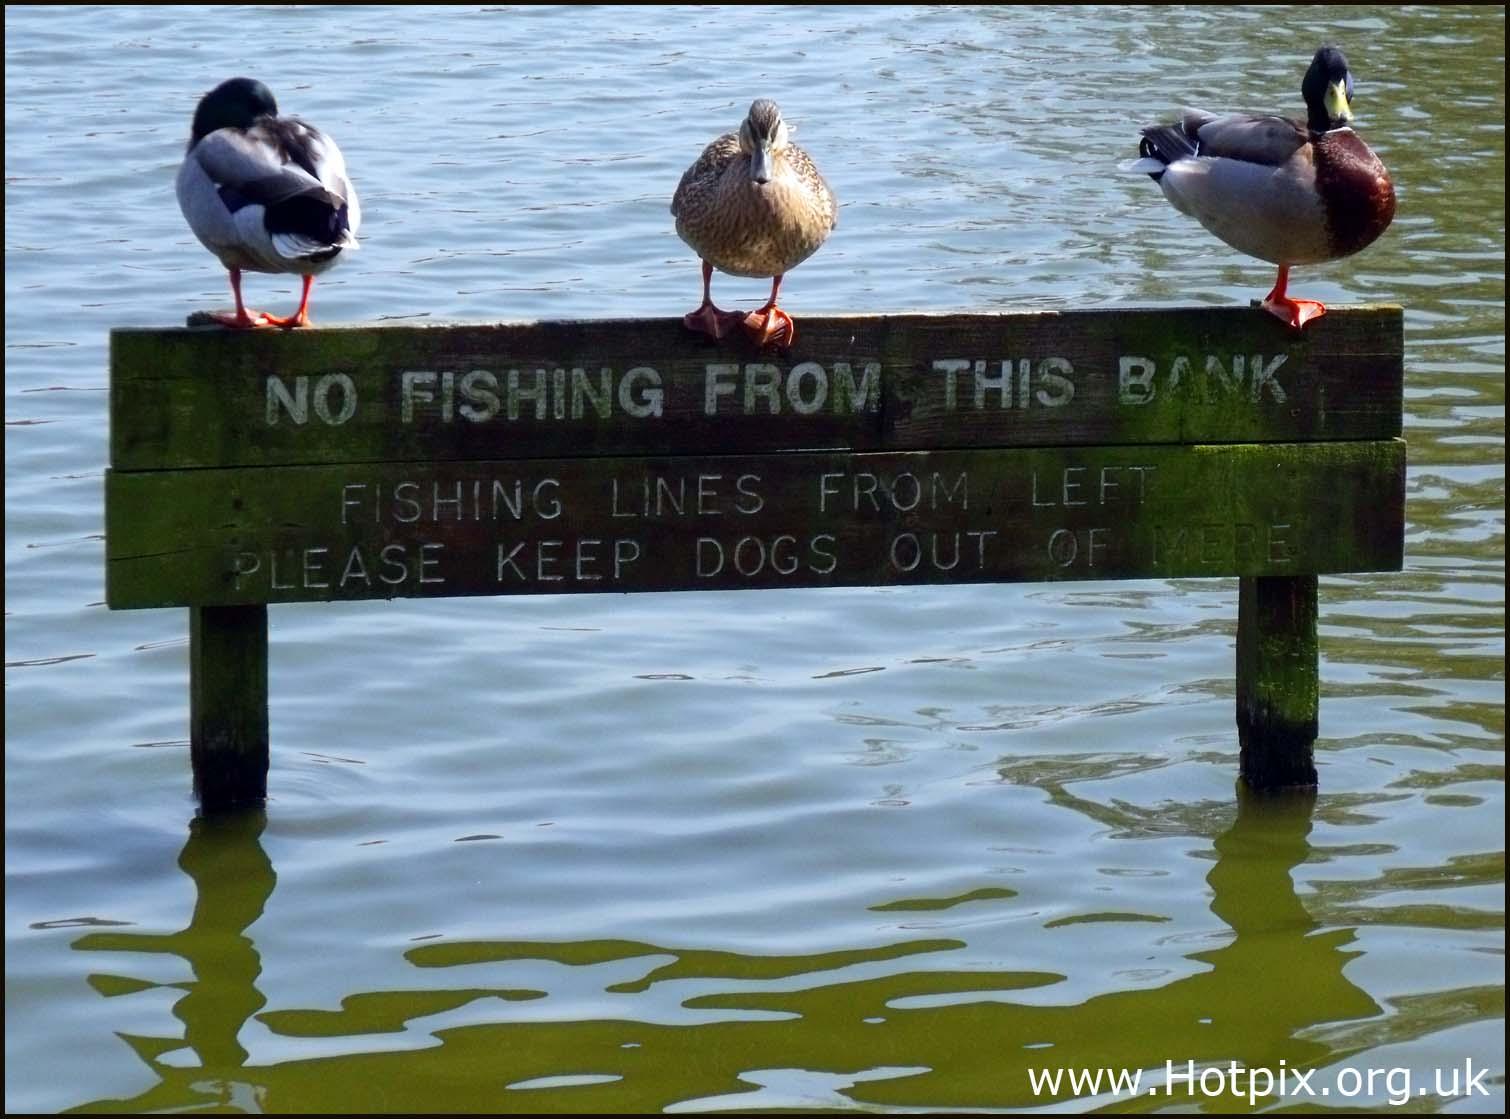 Nature,birds,ducks,water,sign,no,fishing,from,this,bank,No Fishing,f,birds ducks water sign no fishing from this bank No,Fishing from,cheshire,knutsford,northwich,middlewich,M6,motorway,hotpix!